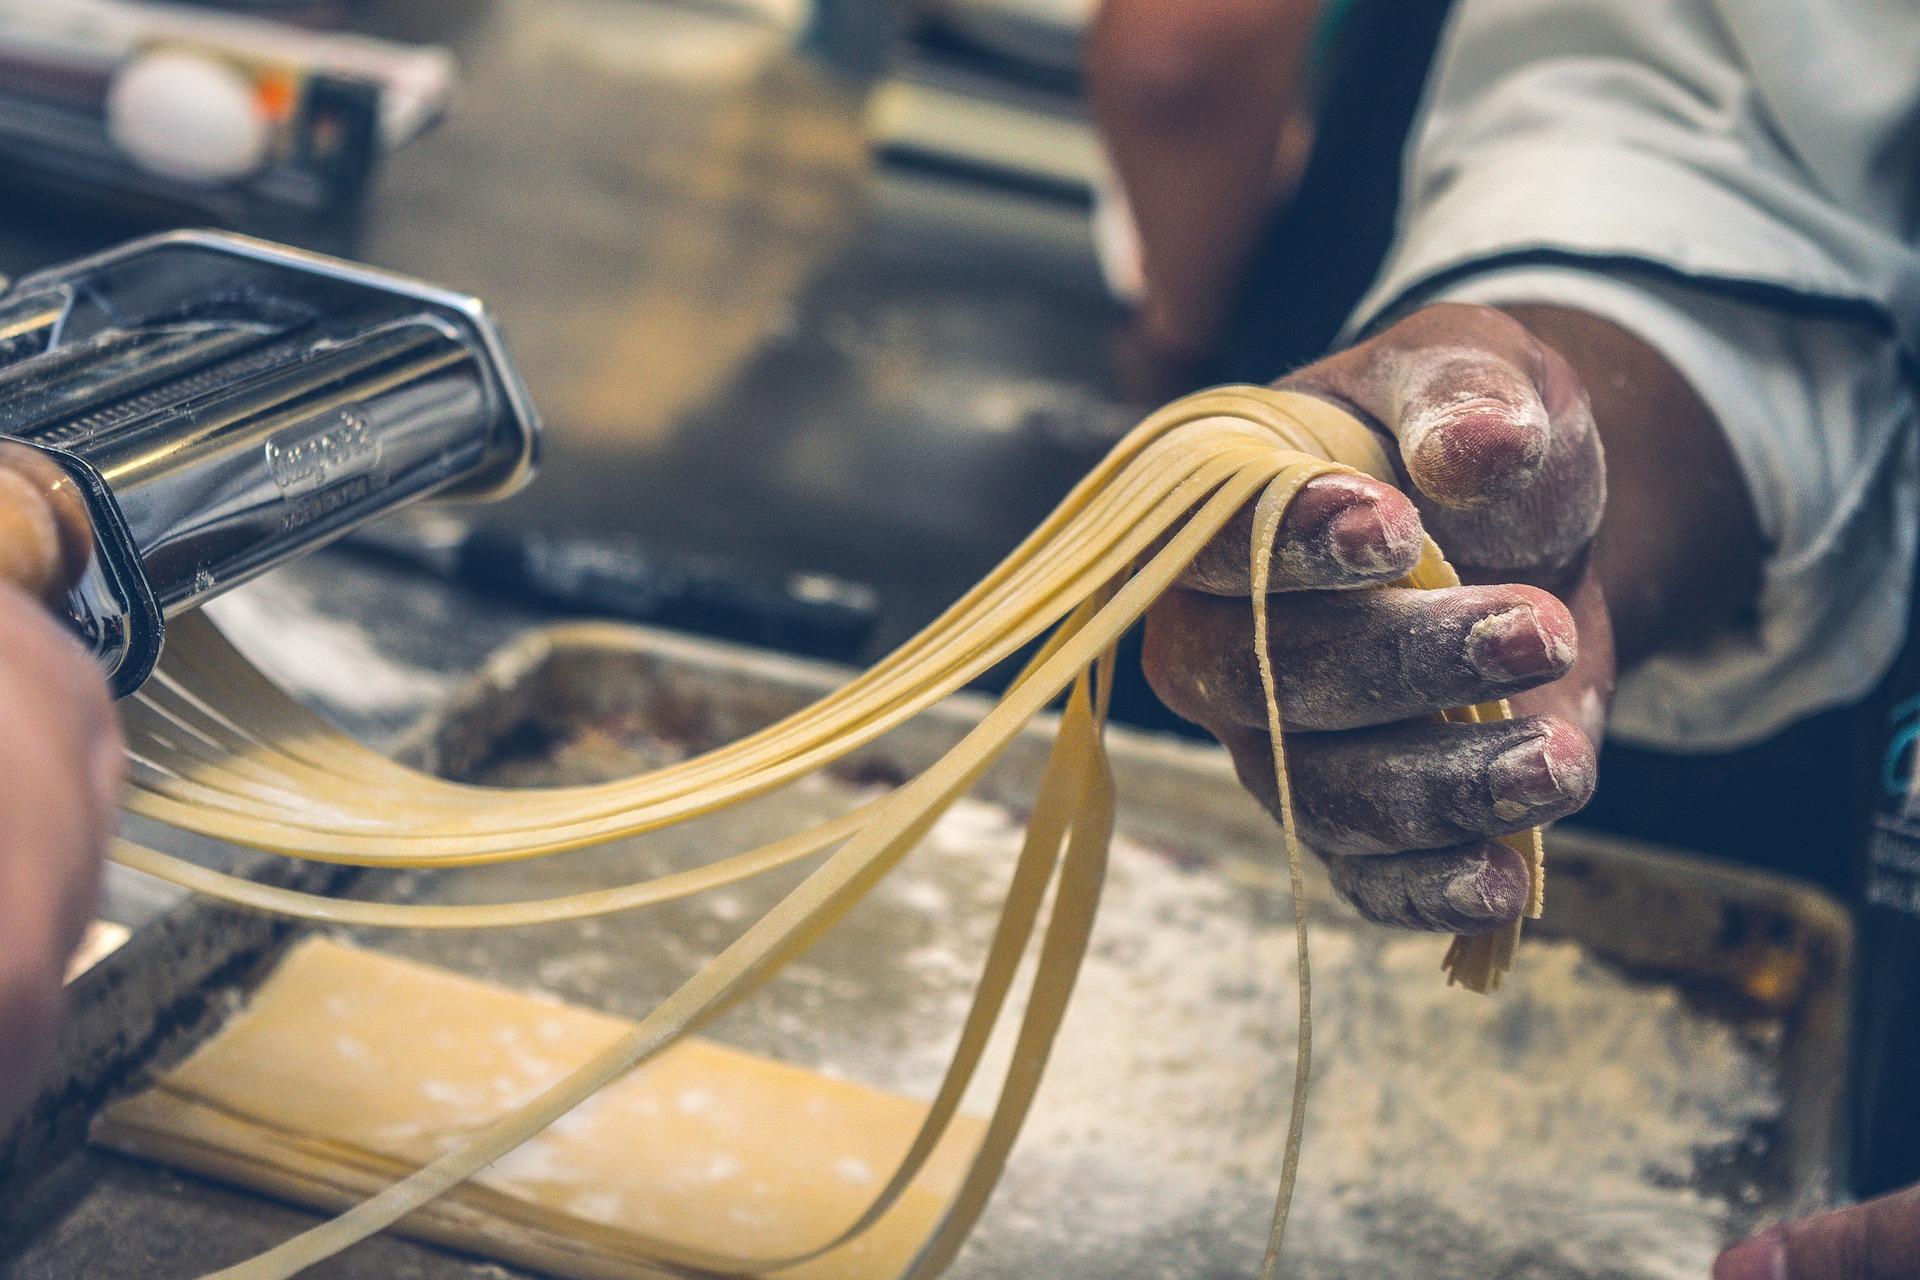 pasta-mana-foods-recipes-1.jpg